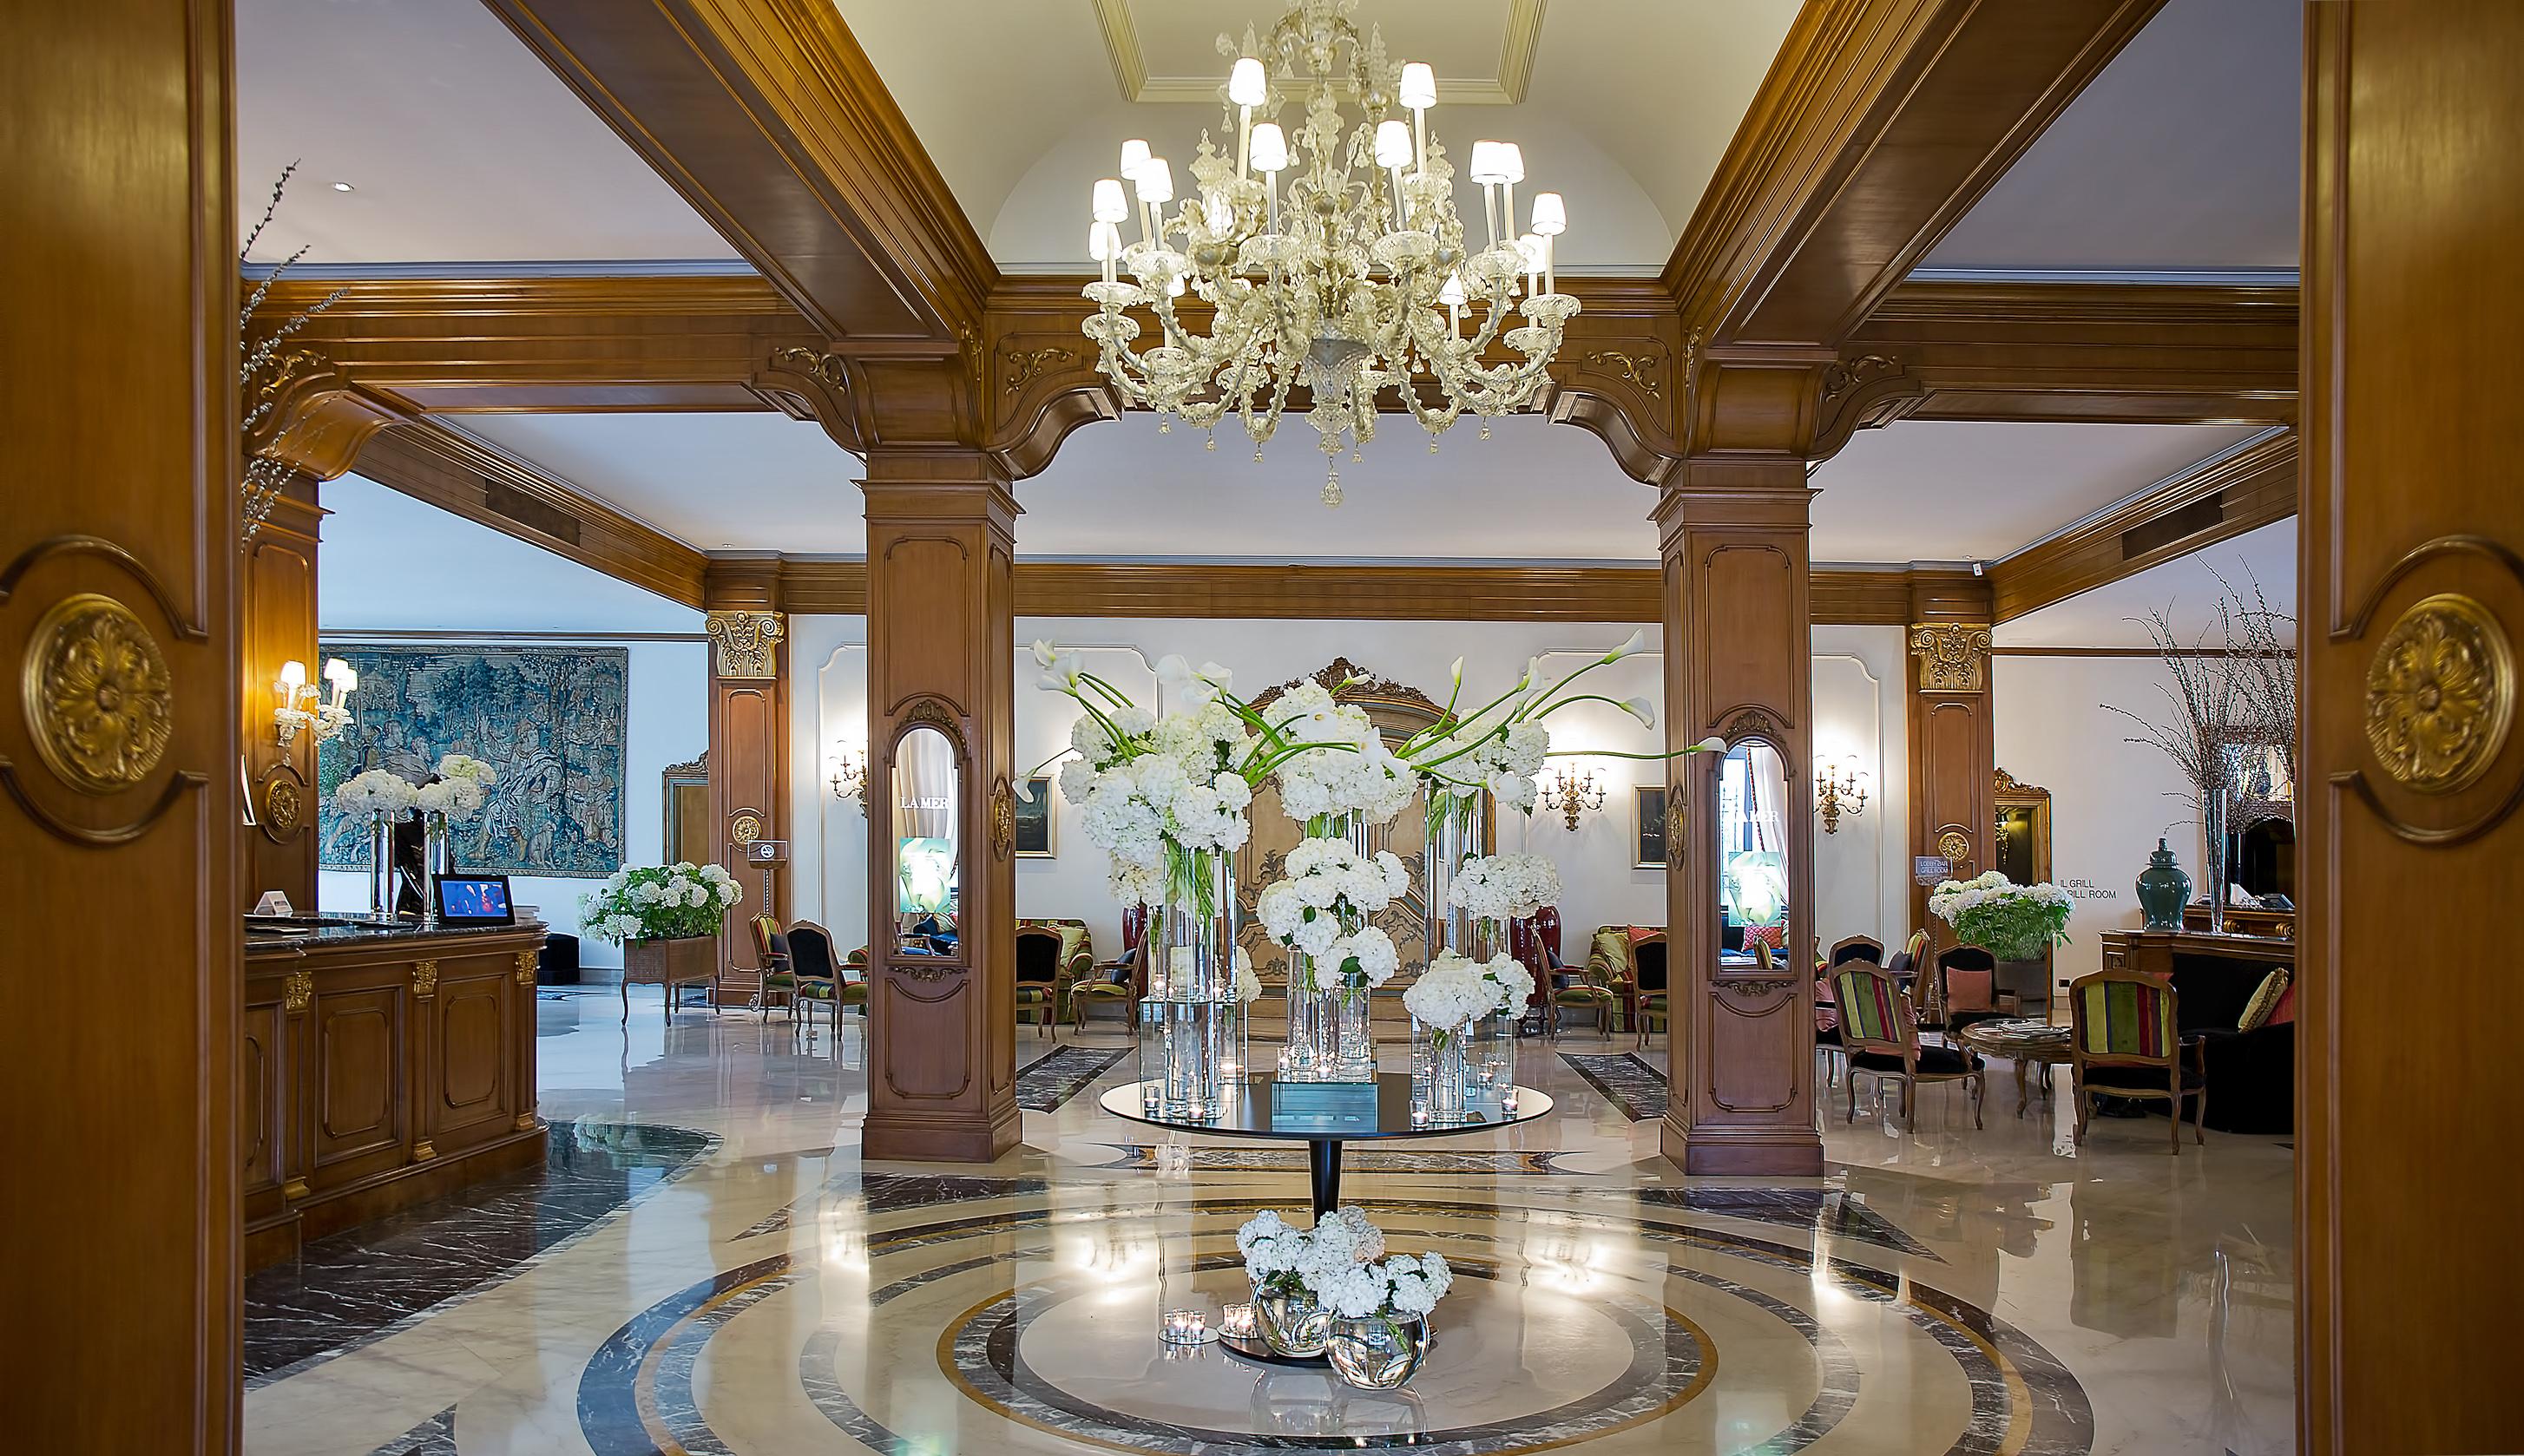 Hotel Aldrovandi Villa Borghese - Eingangshalle